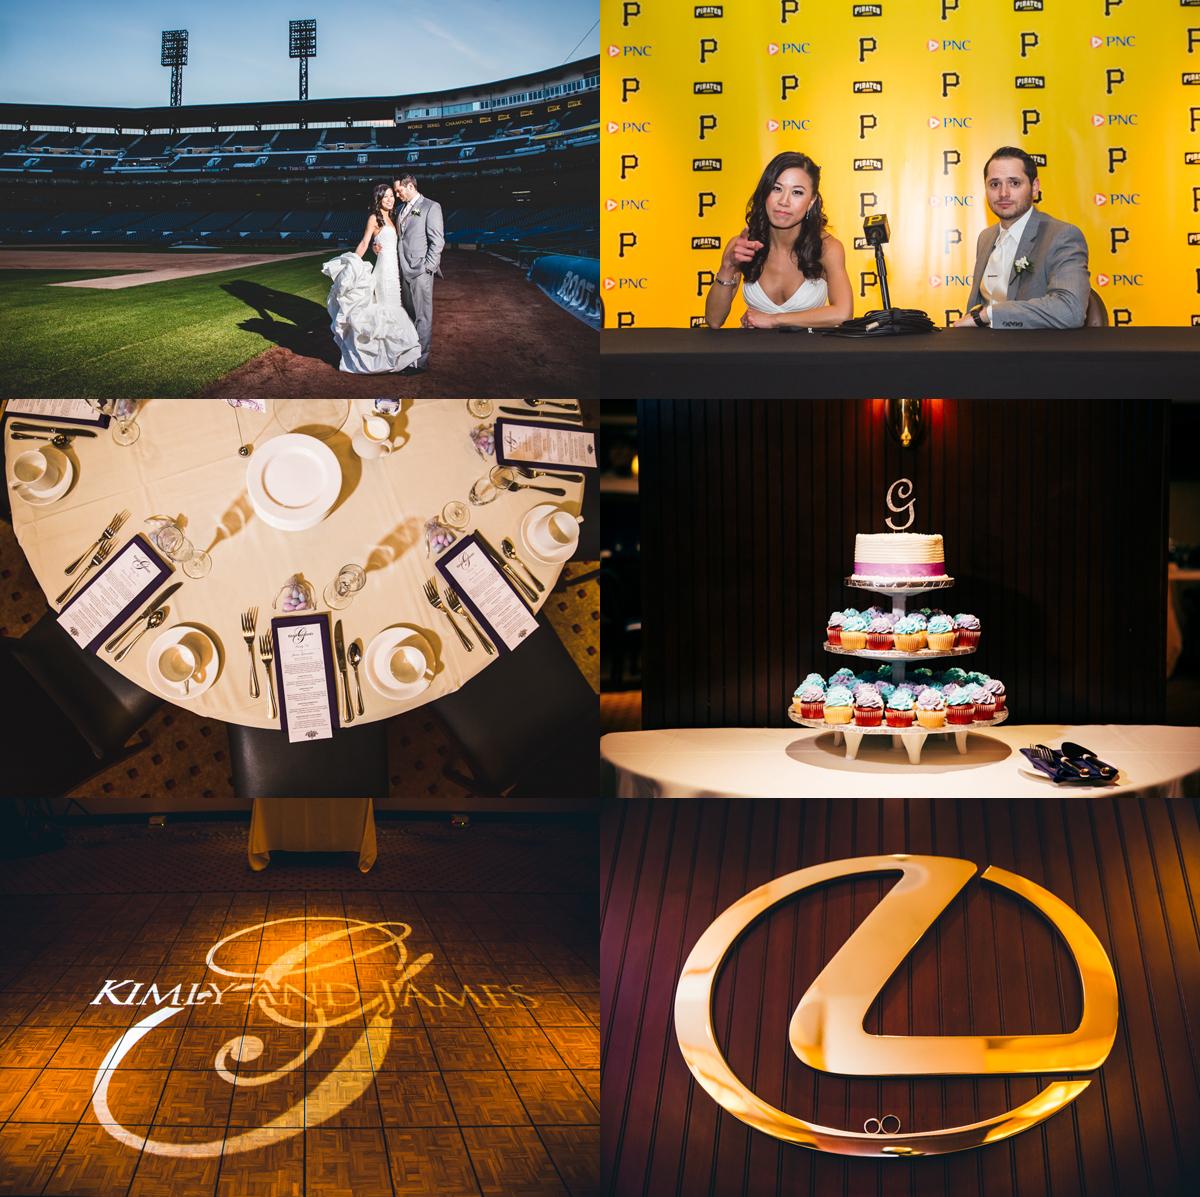 pittsburgh-wedding-photographer-kimly-james-heinz-chapel-pnc-lexus-club-tea-ceremony-14